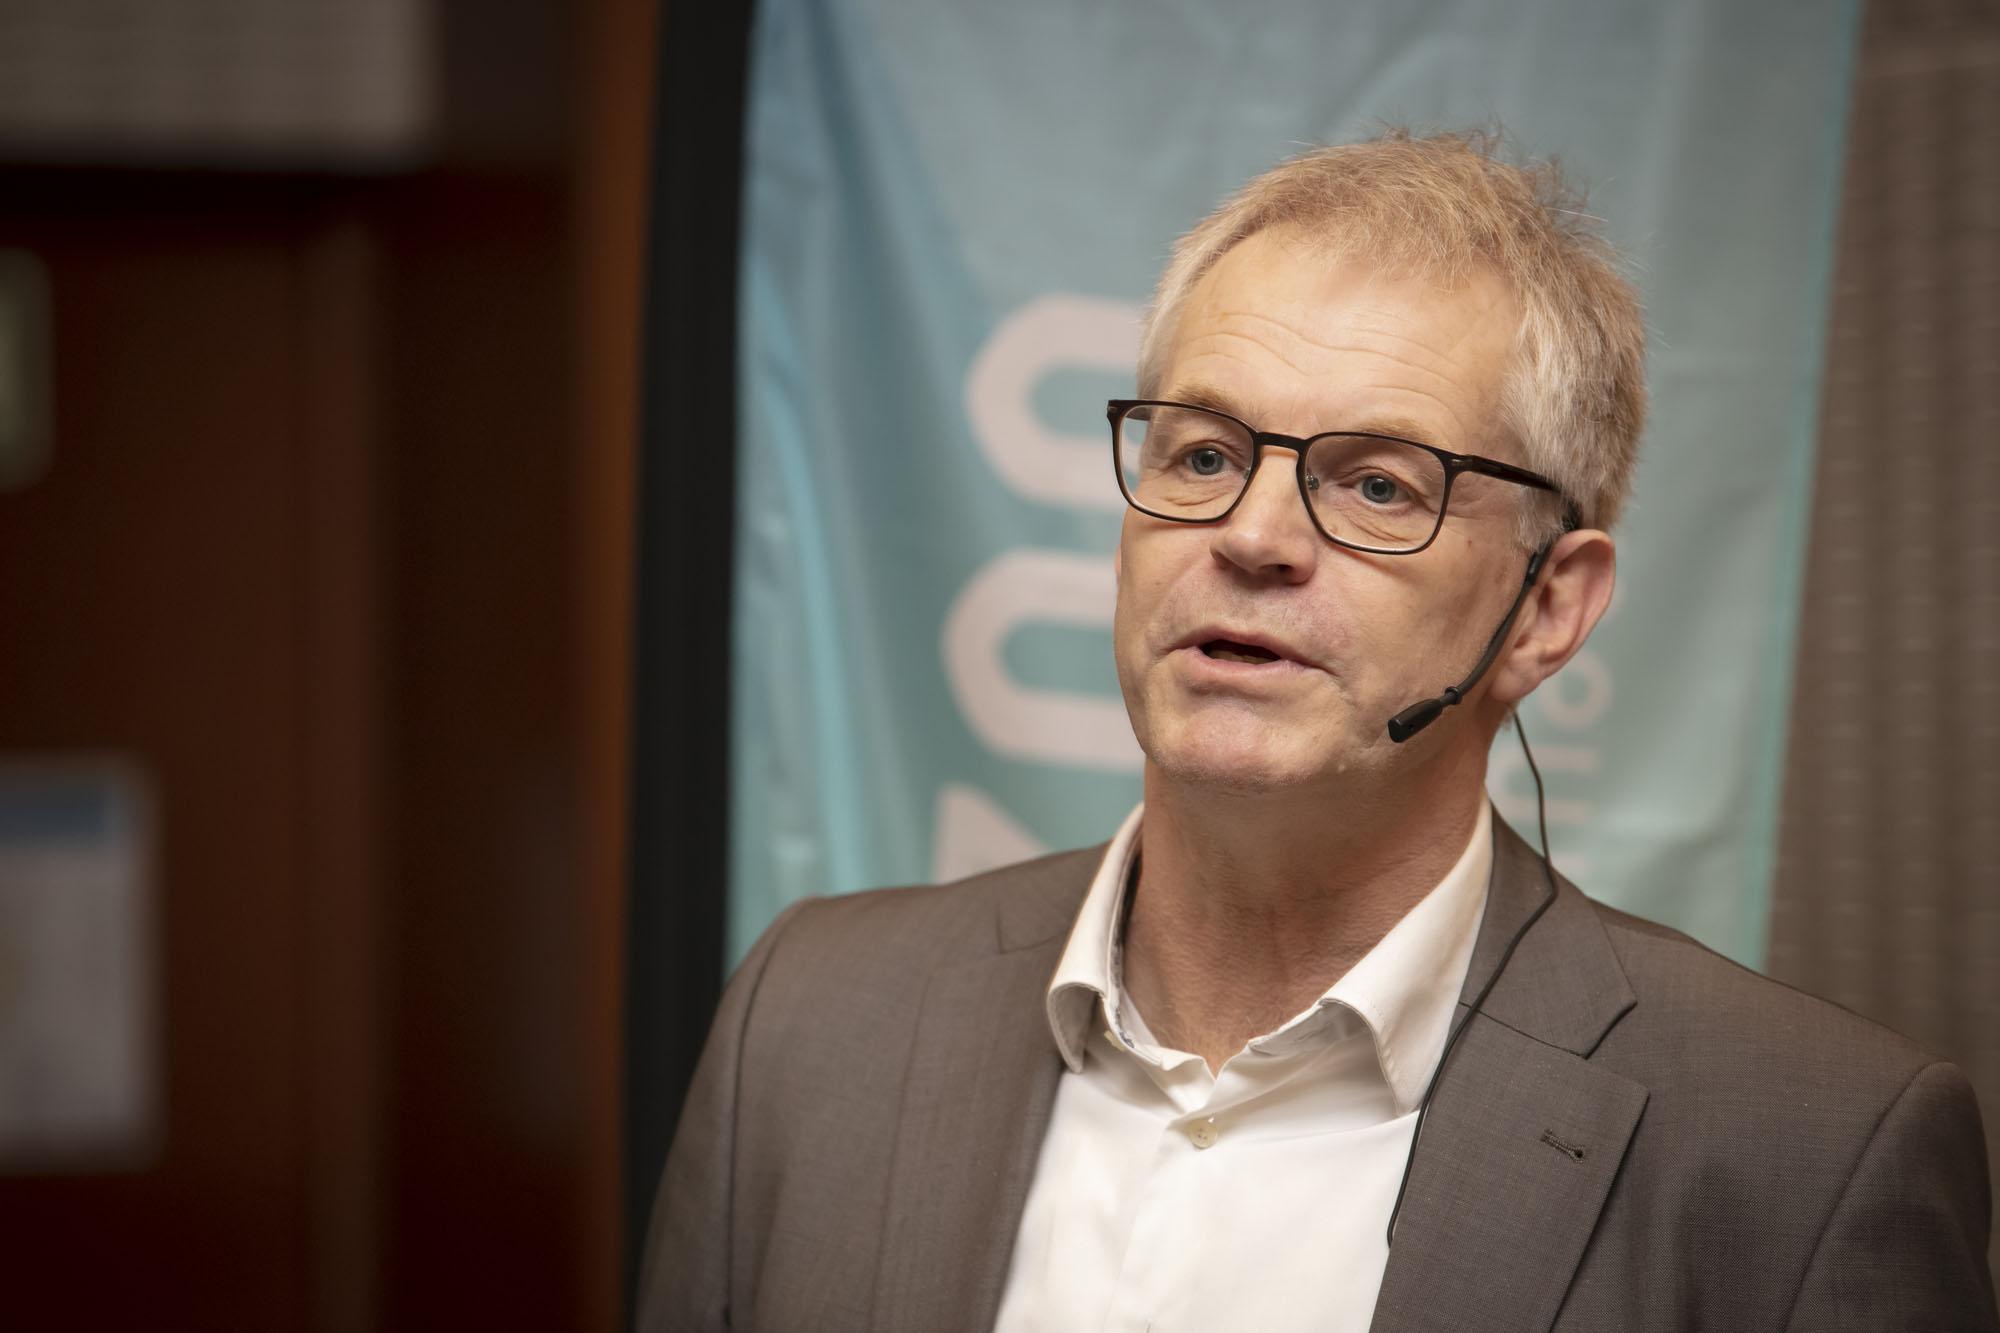 Pieter Imhof (BioBTX)